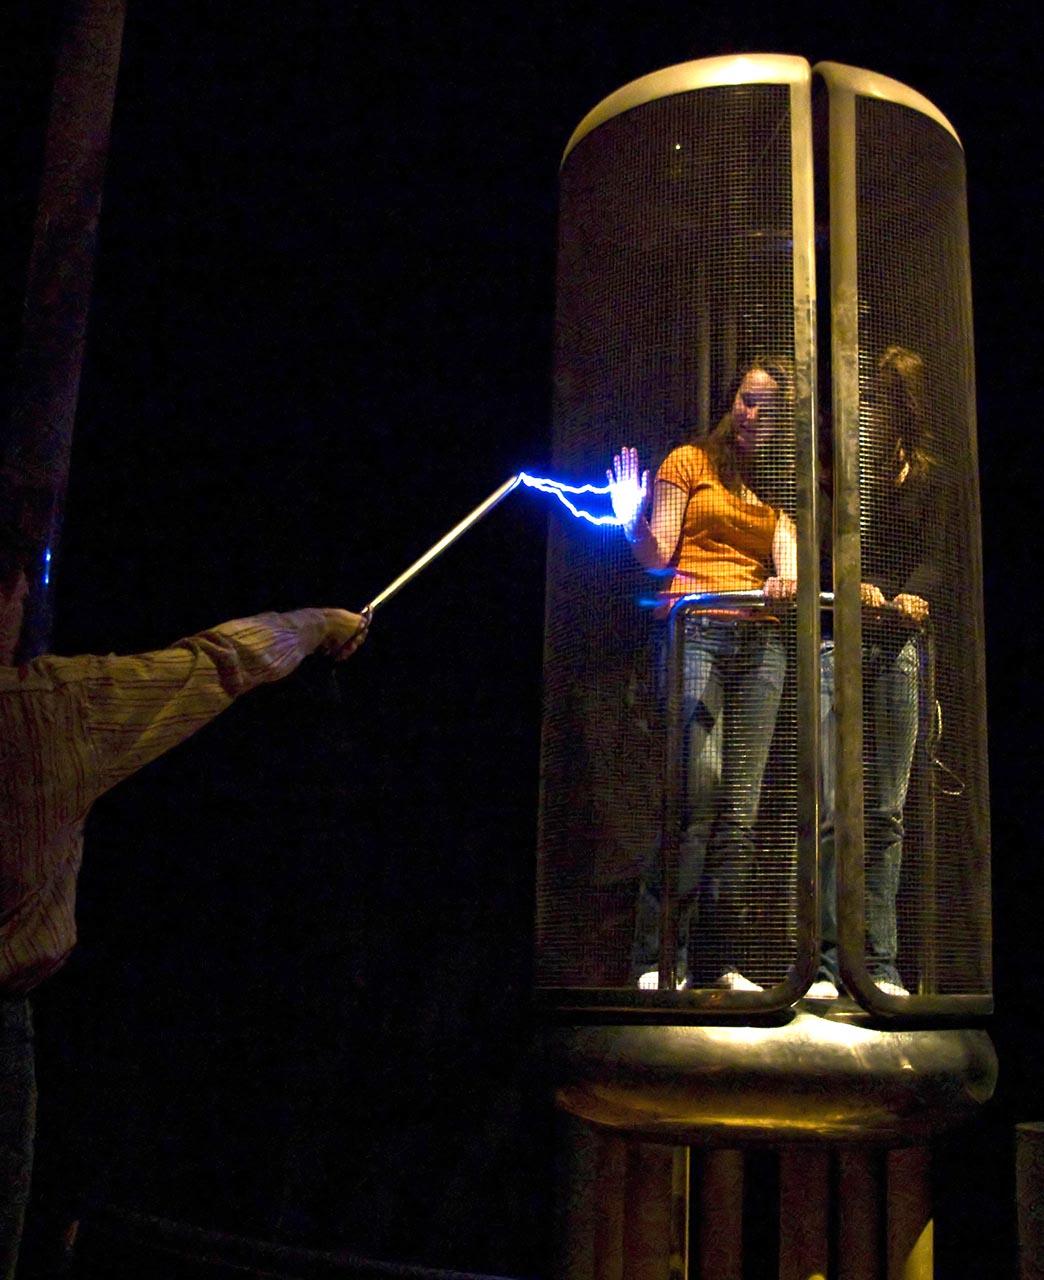 https://upload.wikimedia.org/wikipedia/commons/c/c0/Cage_de_Faraday.jpg